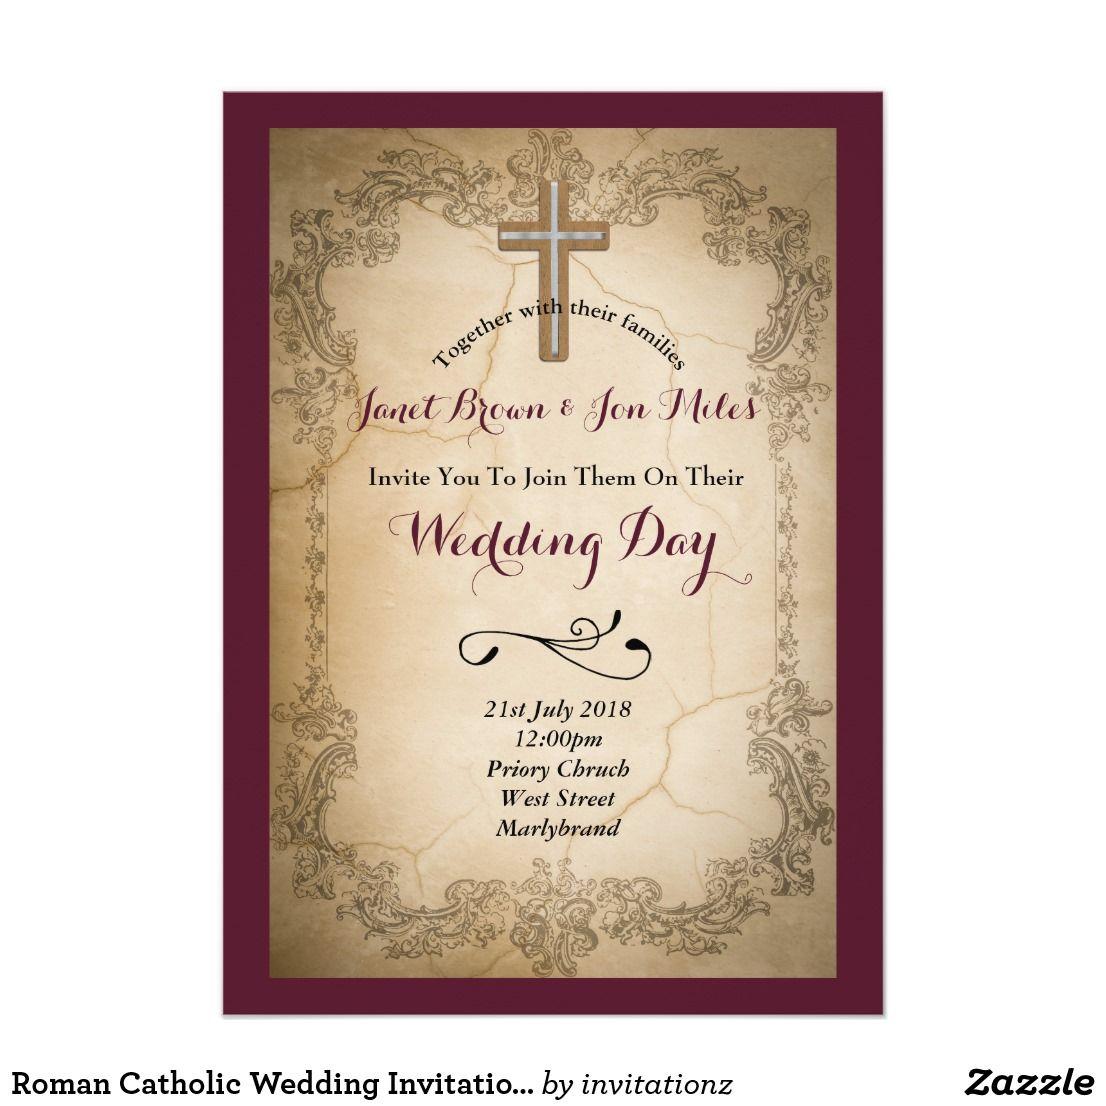 Roman Catholic Wedding Invitation Rustic Burgundy | Trending Wedding ...